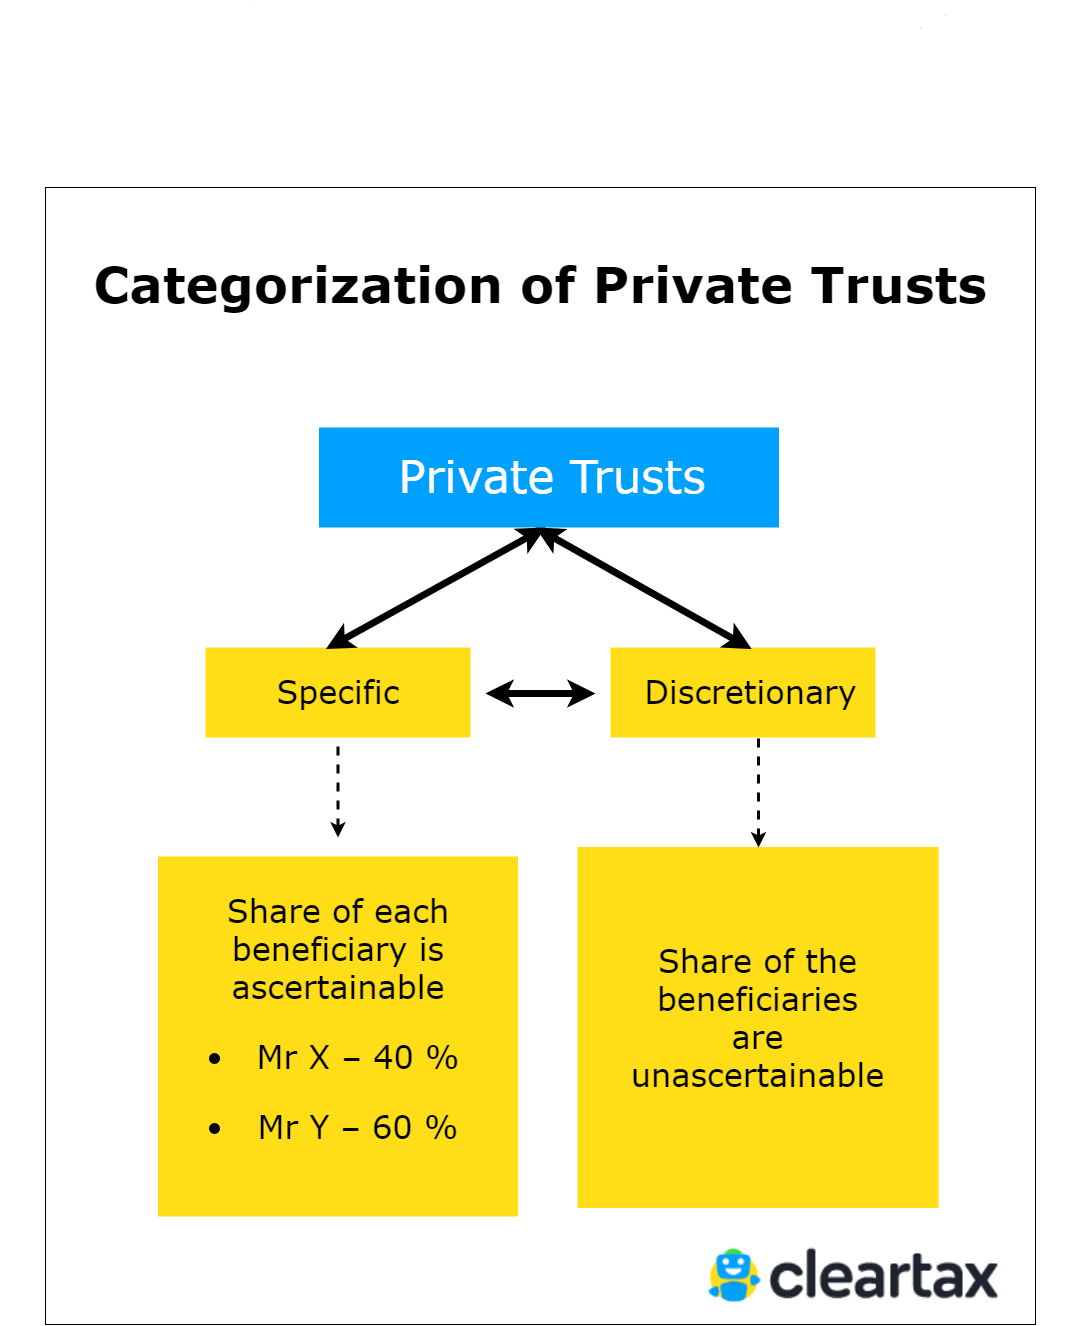 Categorization of Private Trusts